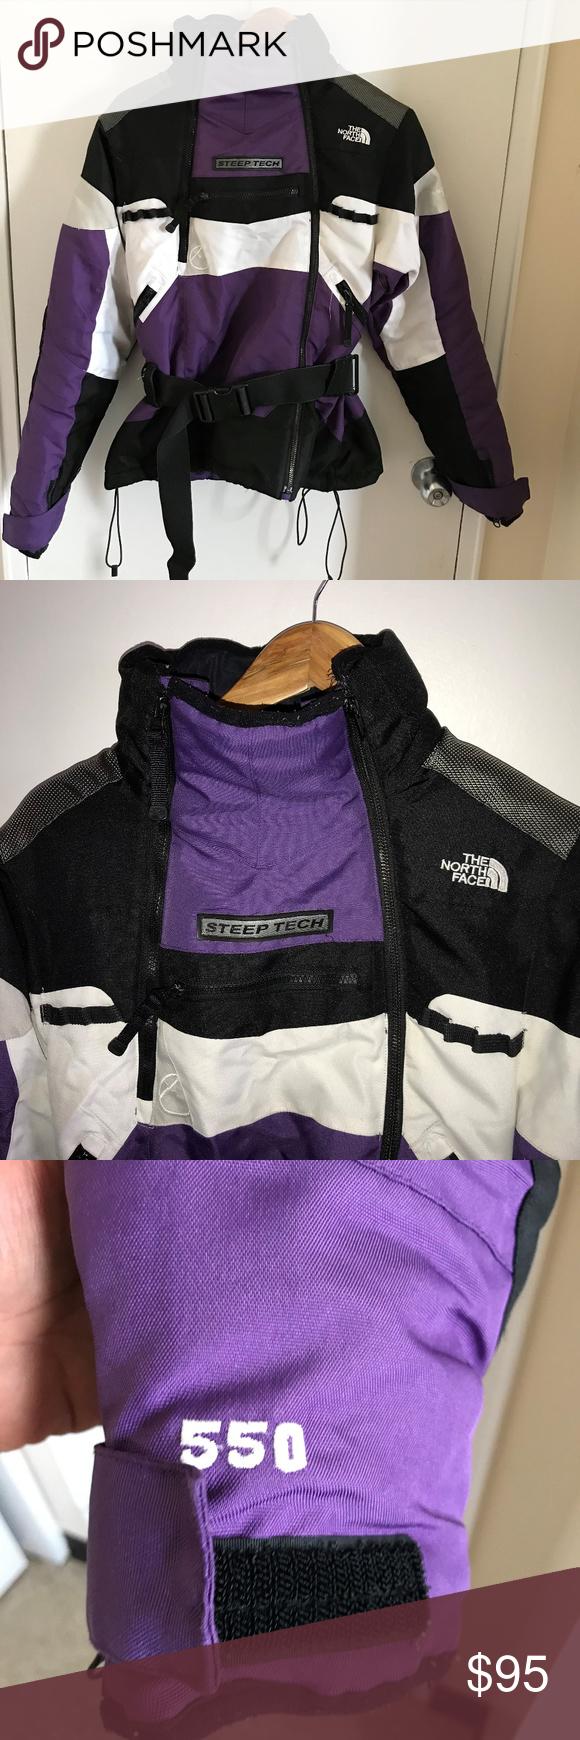 North Face Steep Tech White Black Purple Vintage S Beautiful Jacket Purple Jacket North Face Women [ 1740 x 580 Pixel ]